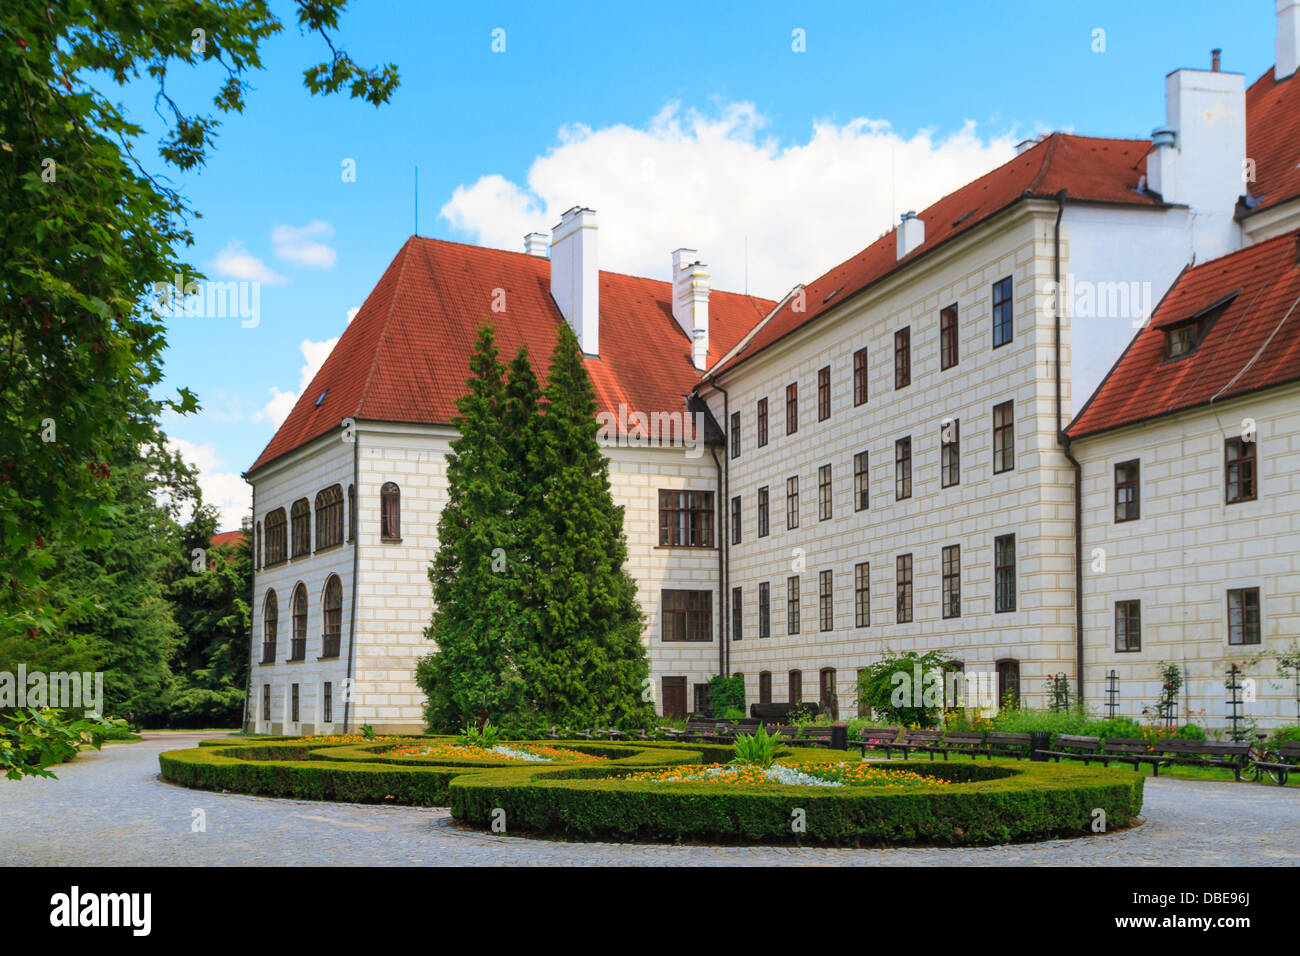 Trebon (Wittingau) Renaissance Castle (Zamek Trebon), Czech Republic - Stock Image